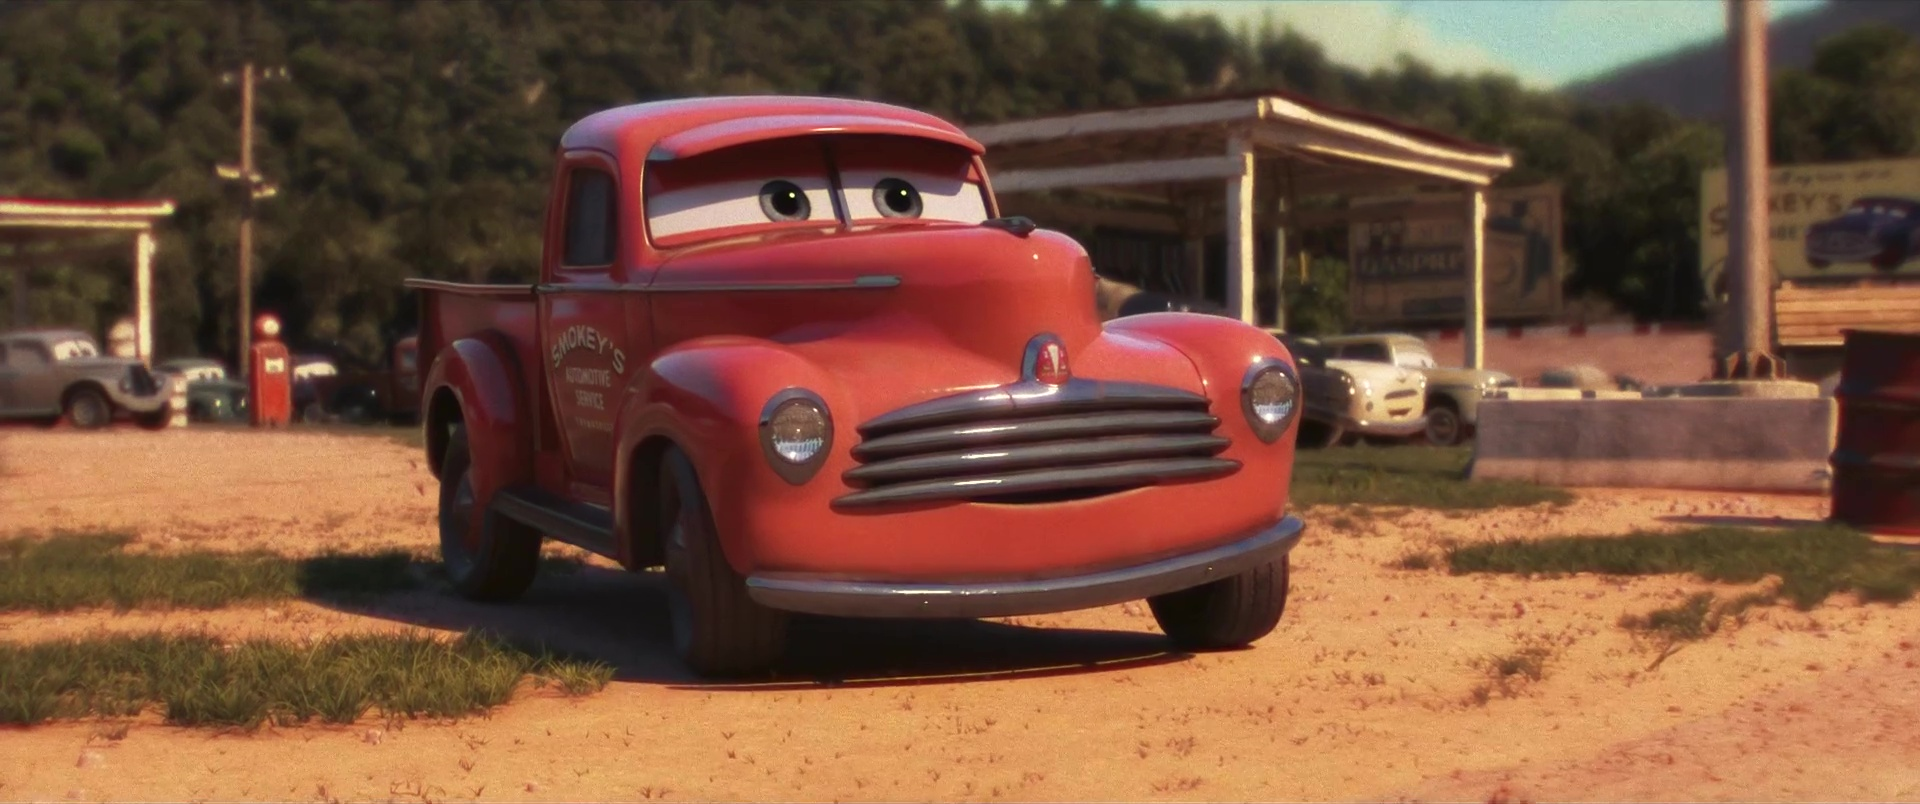 smokey personnage character cars 3 pixar disney